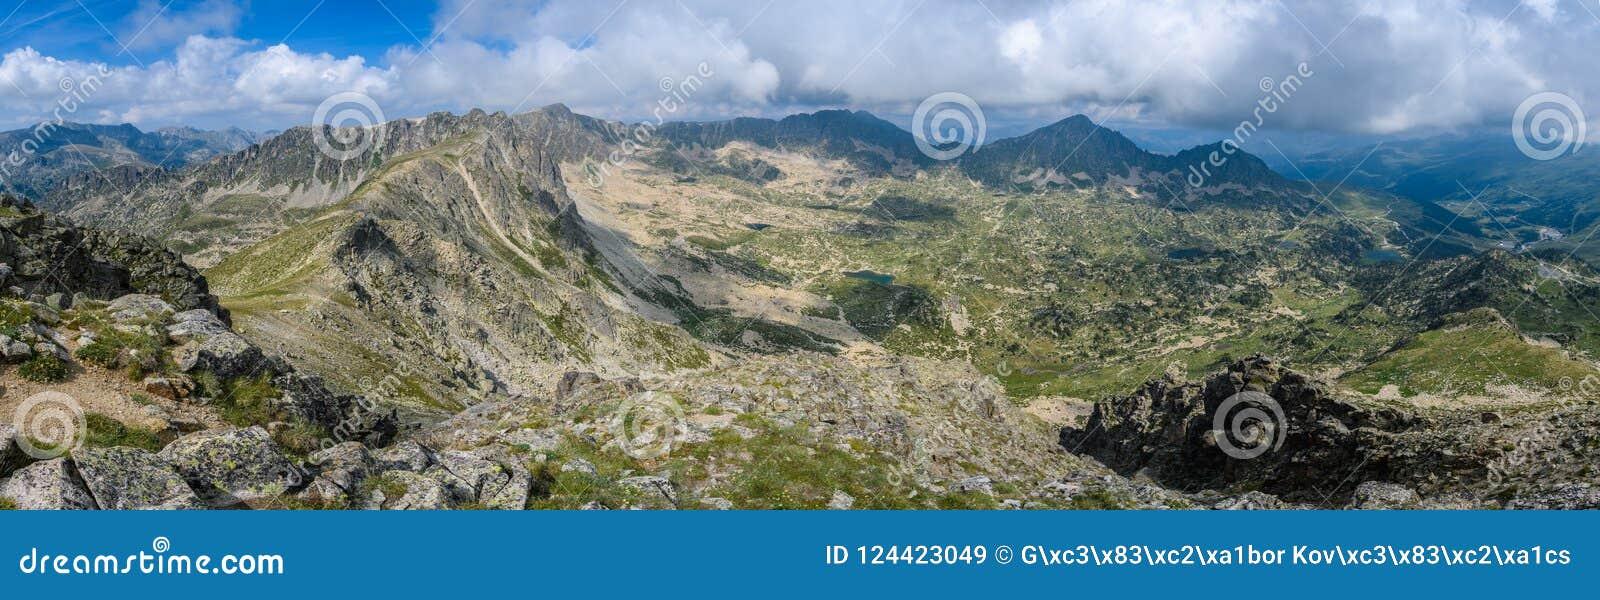 Panoramic view from Montmalus Peak in Andorra